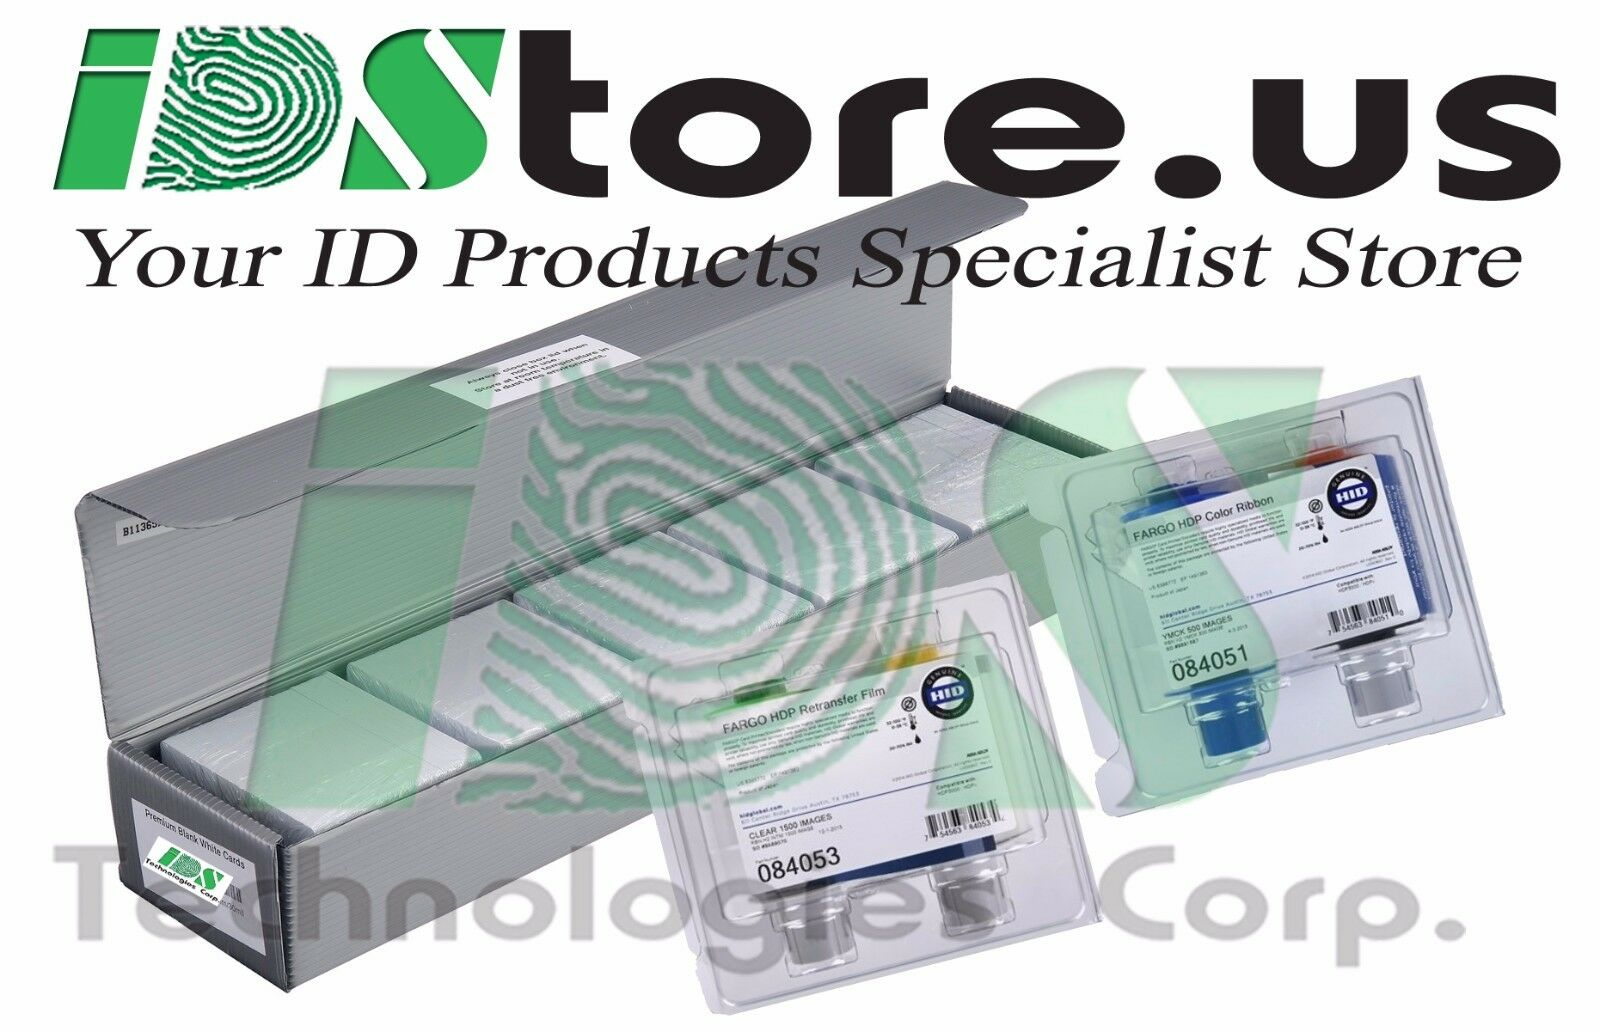 YMCKOK 500 Prints /& Fargo 84053 1500 Print Retransfer Film with Volty ID Premium CR80 30 Mil Graphic Quality PVC Cards Fargo 84051 Color Ribbon Qty 500